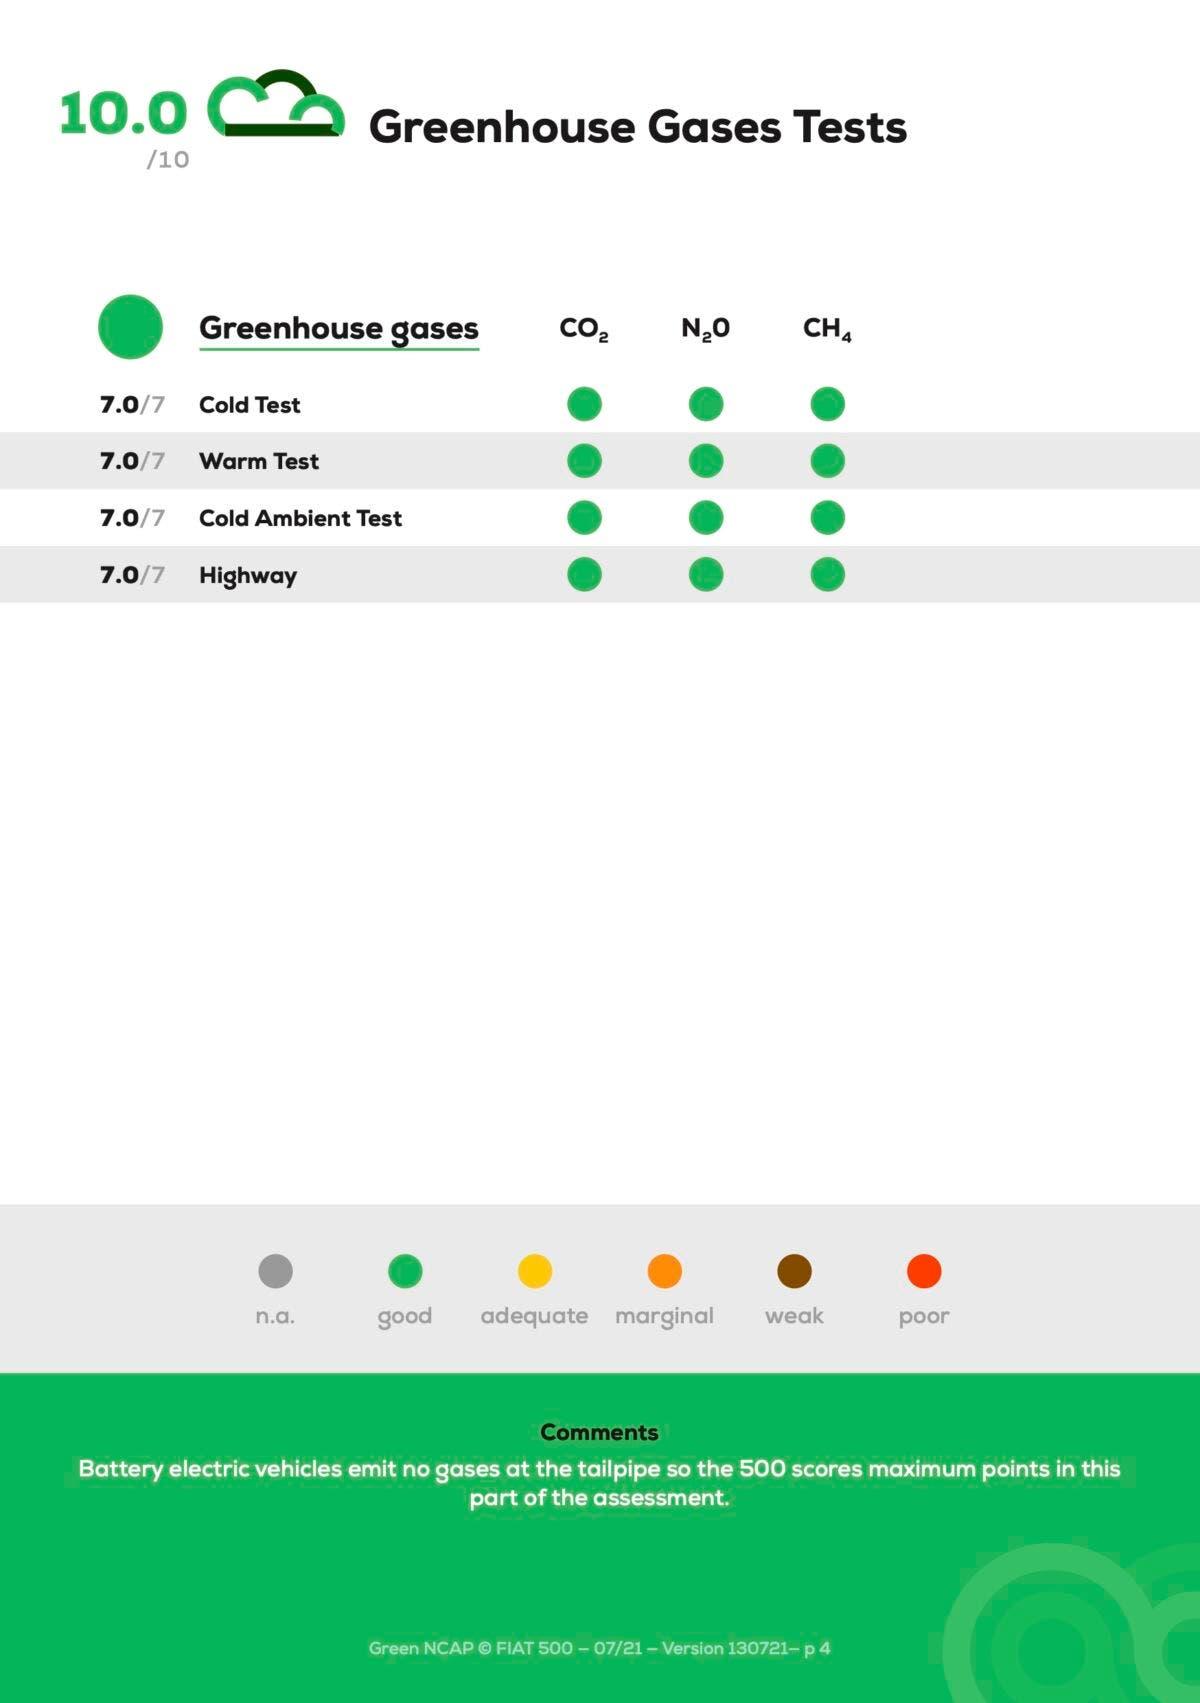 Fiat 500 Elettrica Green NCAP